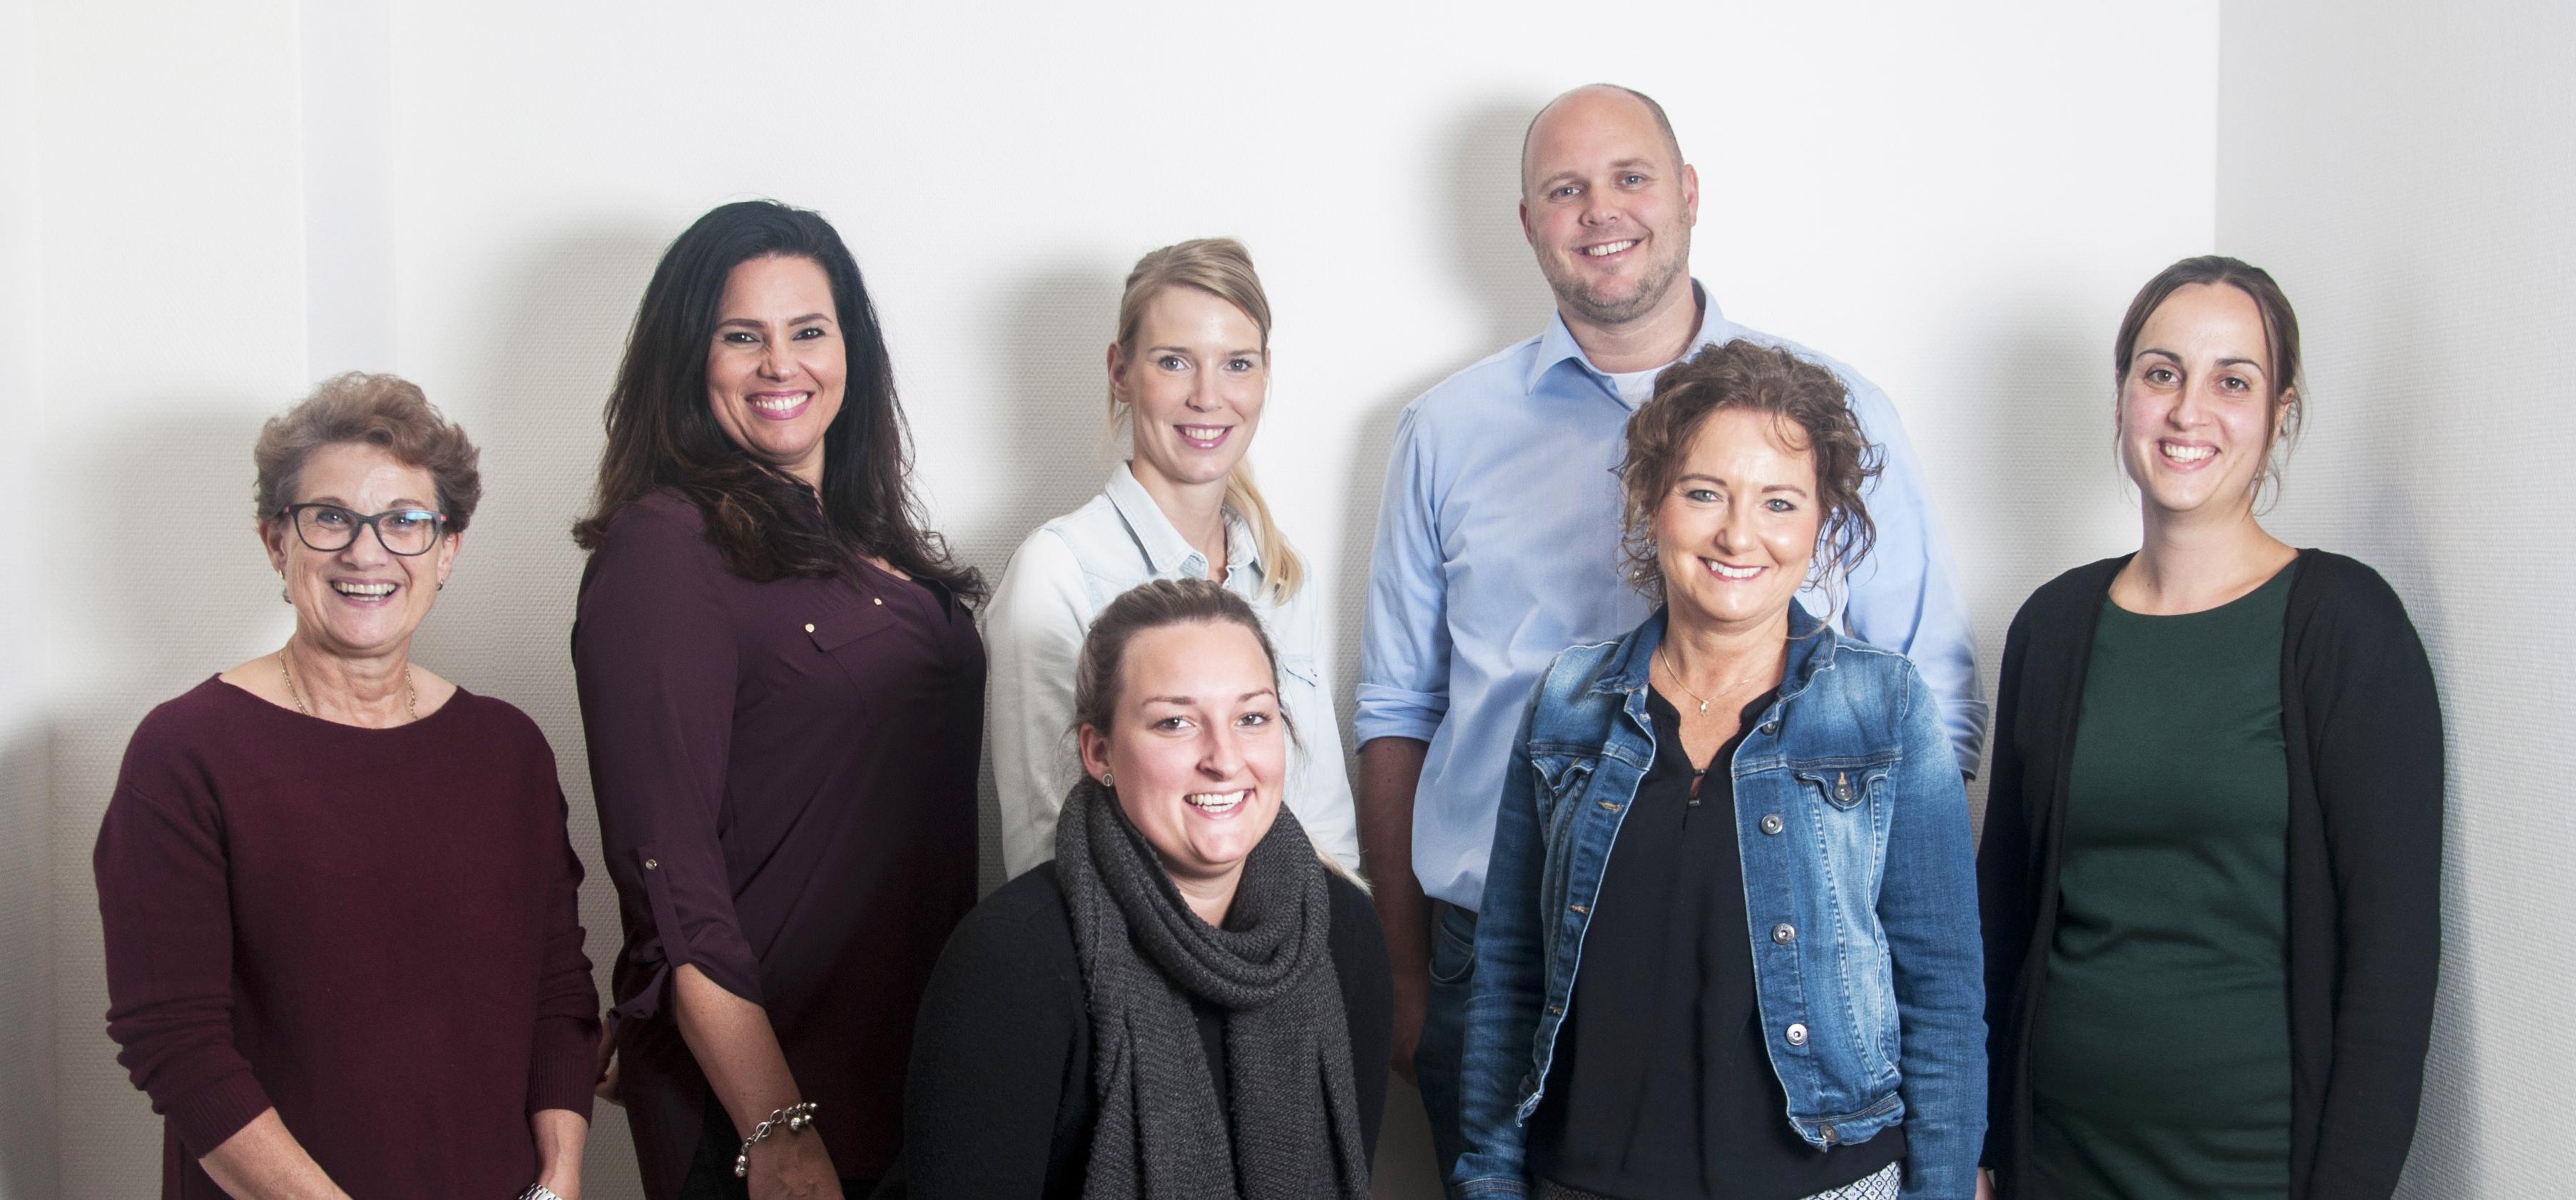 Team Huisartspraktijk Hoeve